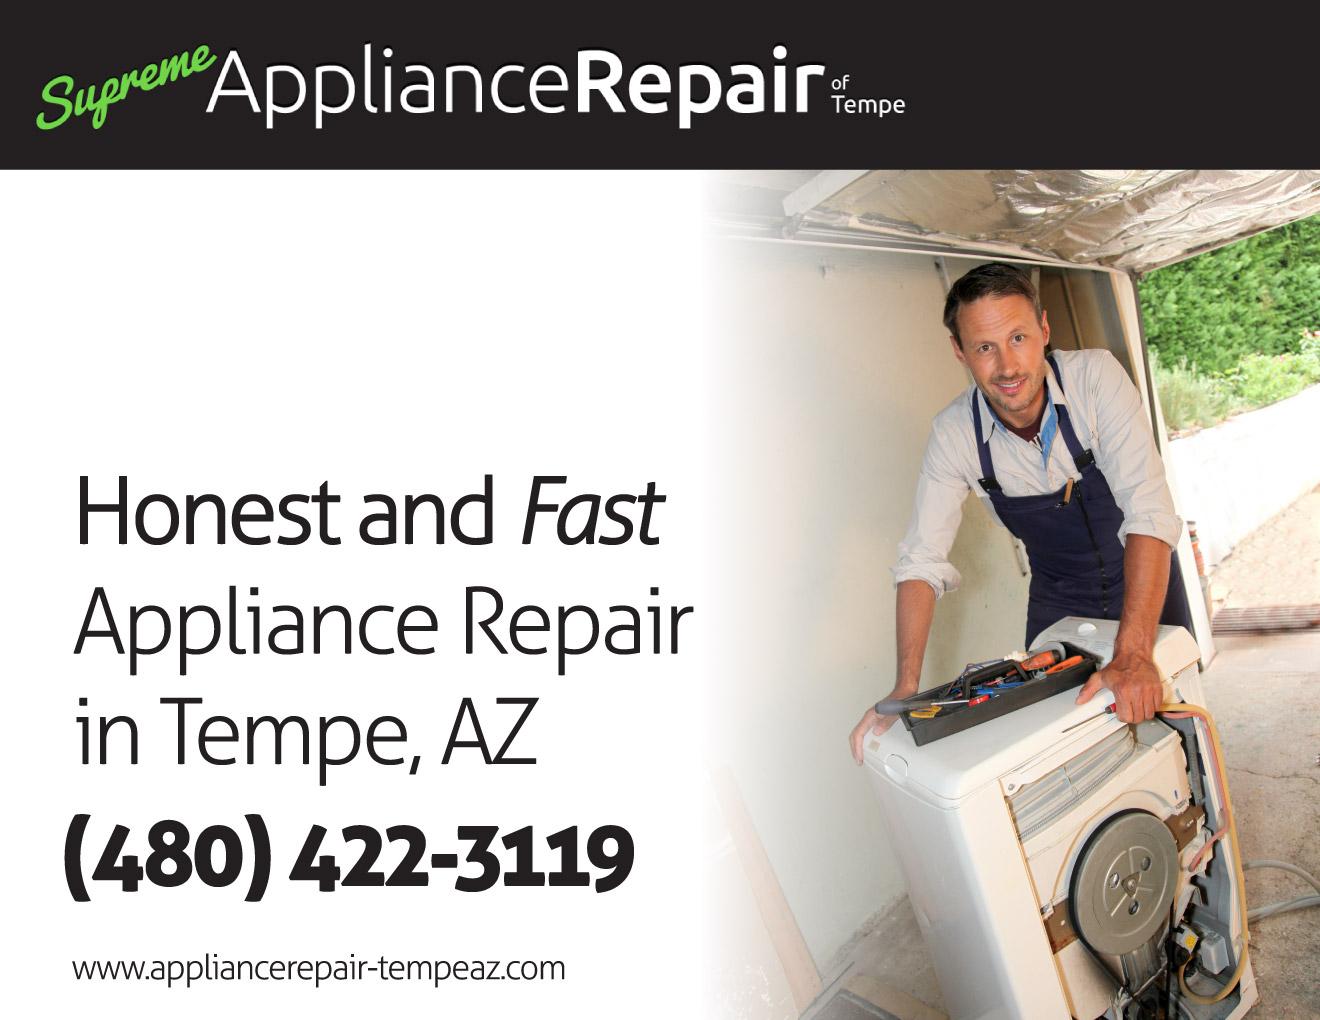 Supreme Appliance Repair Of Tempe 480 422 3119